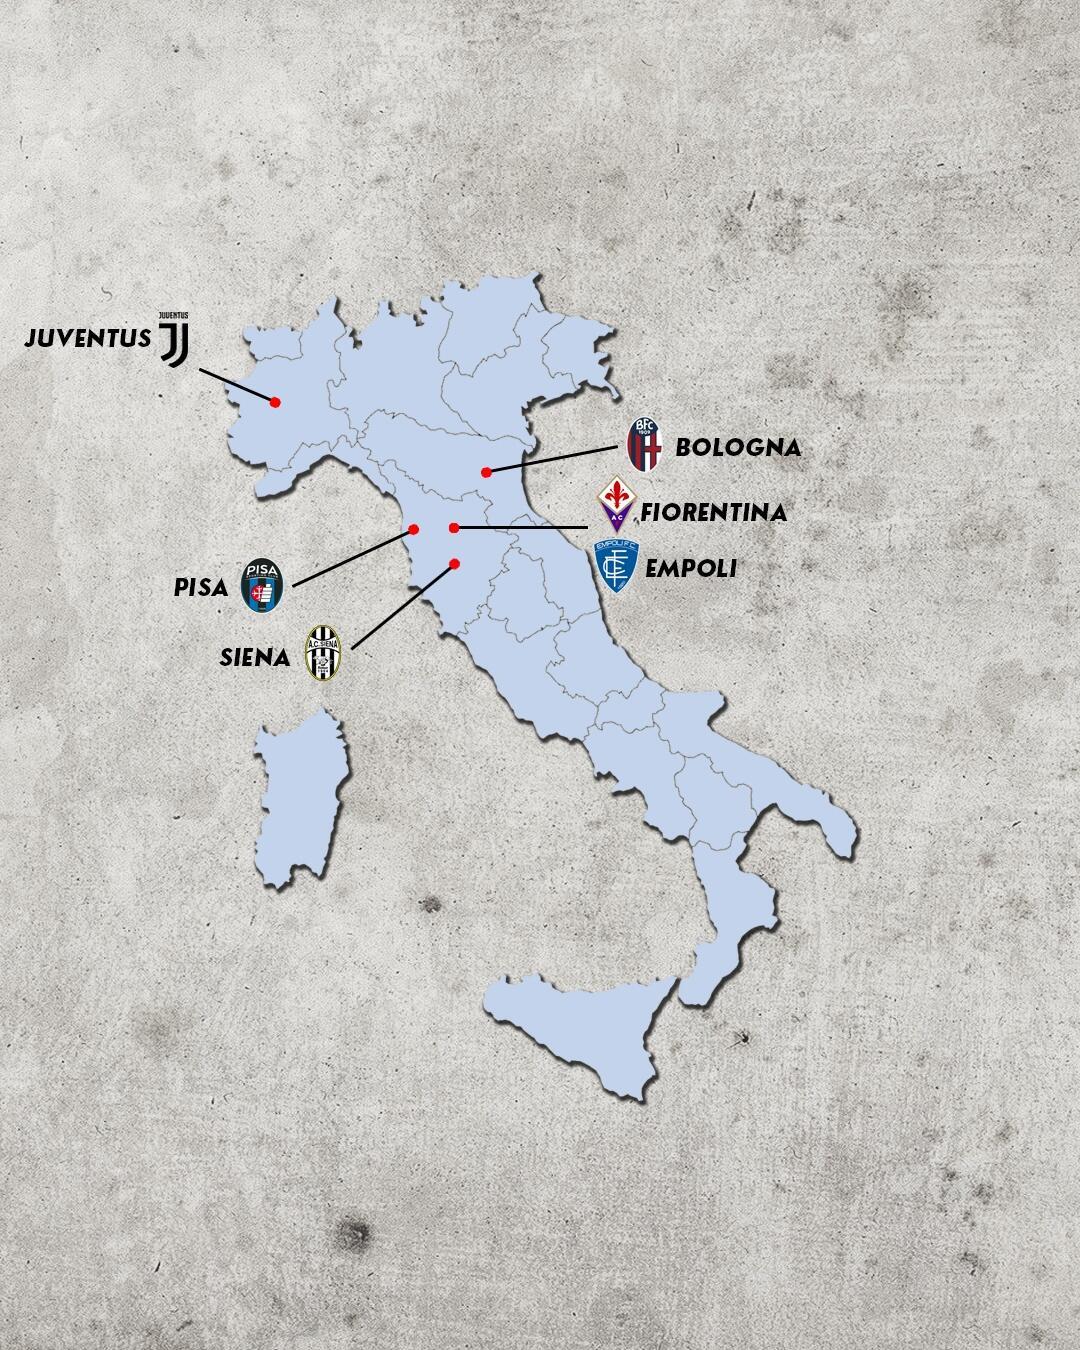 Rivalidades do campeonato italiano - rivais da fiorentina